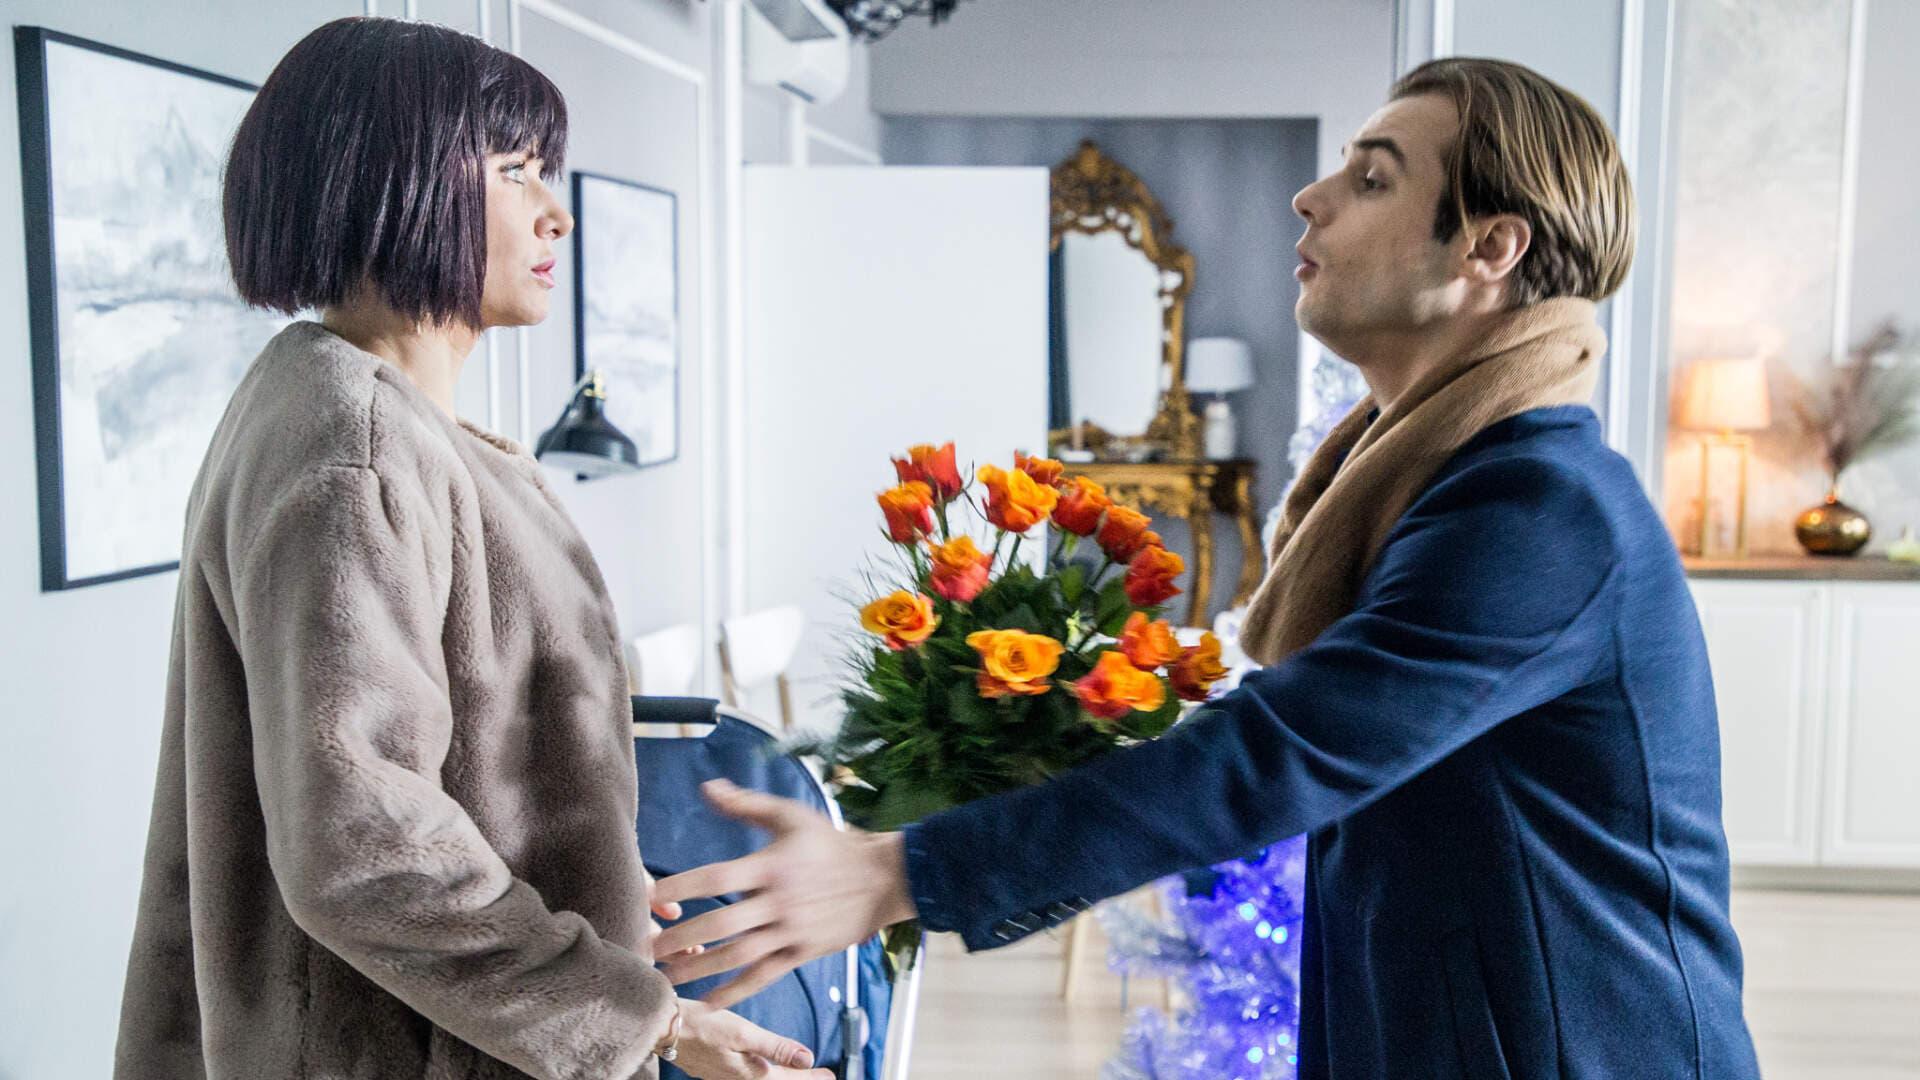 Zakochani po uszy - Season 5 Episode 44 : Episode 44